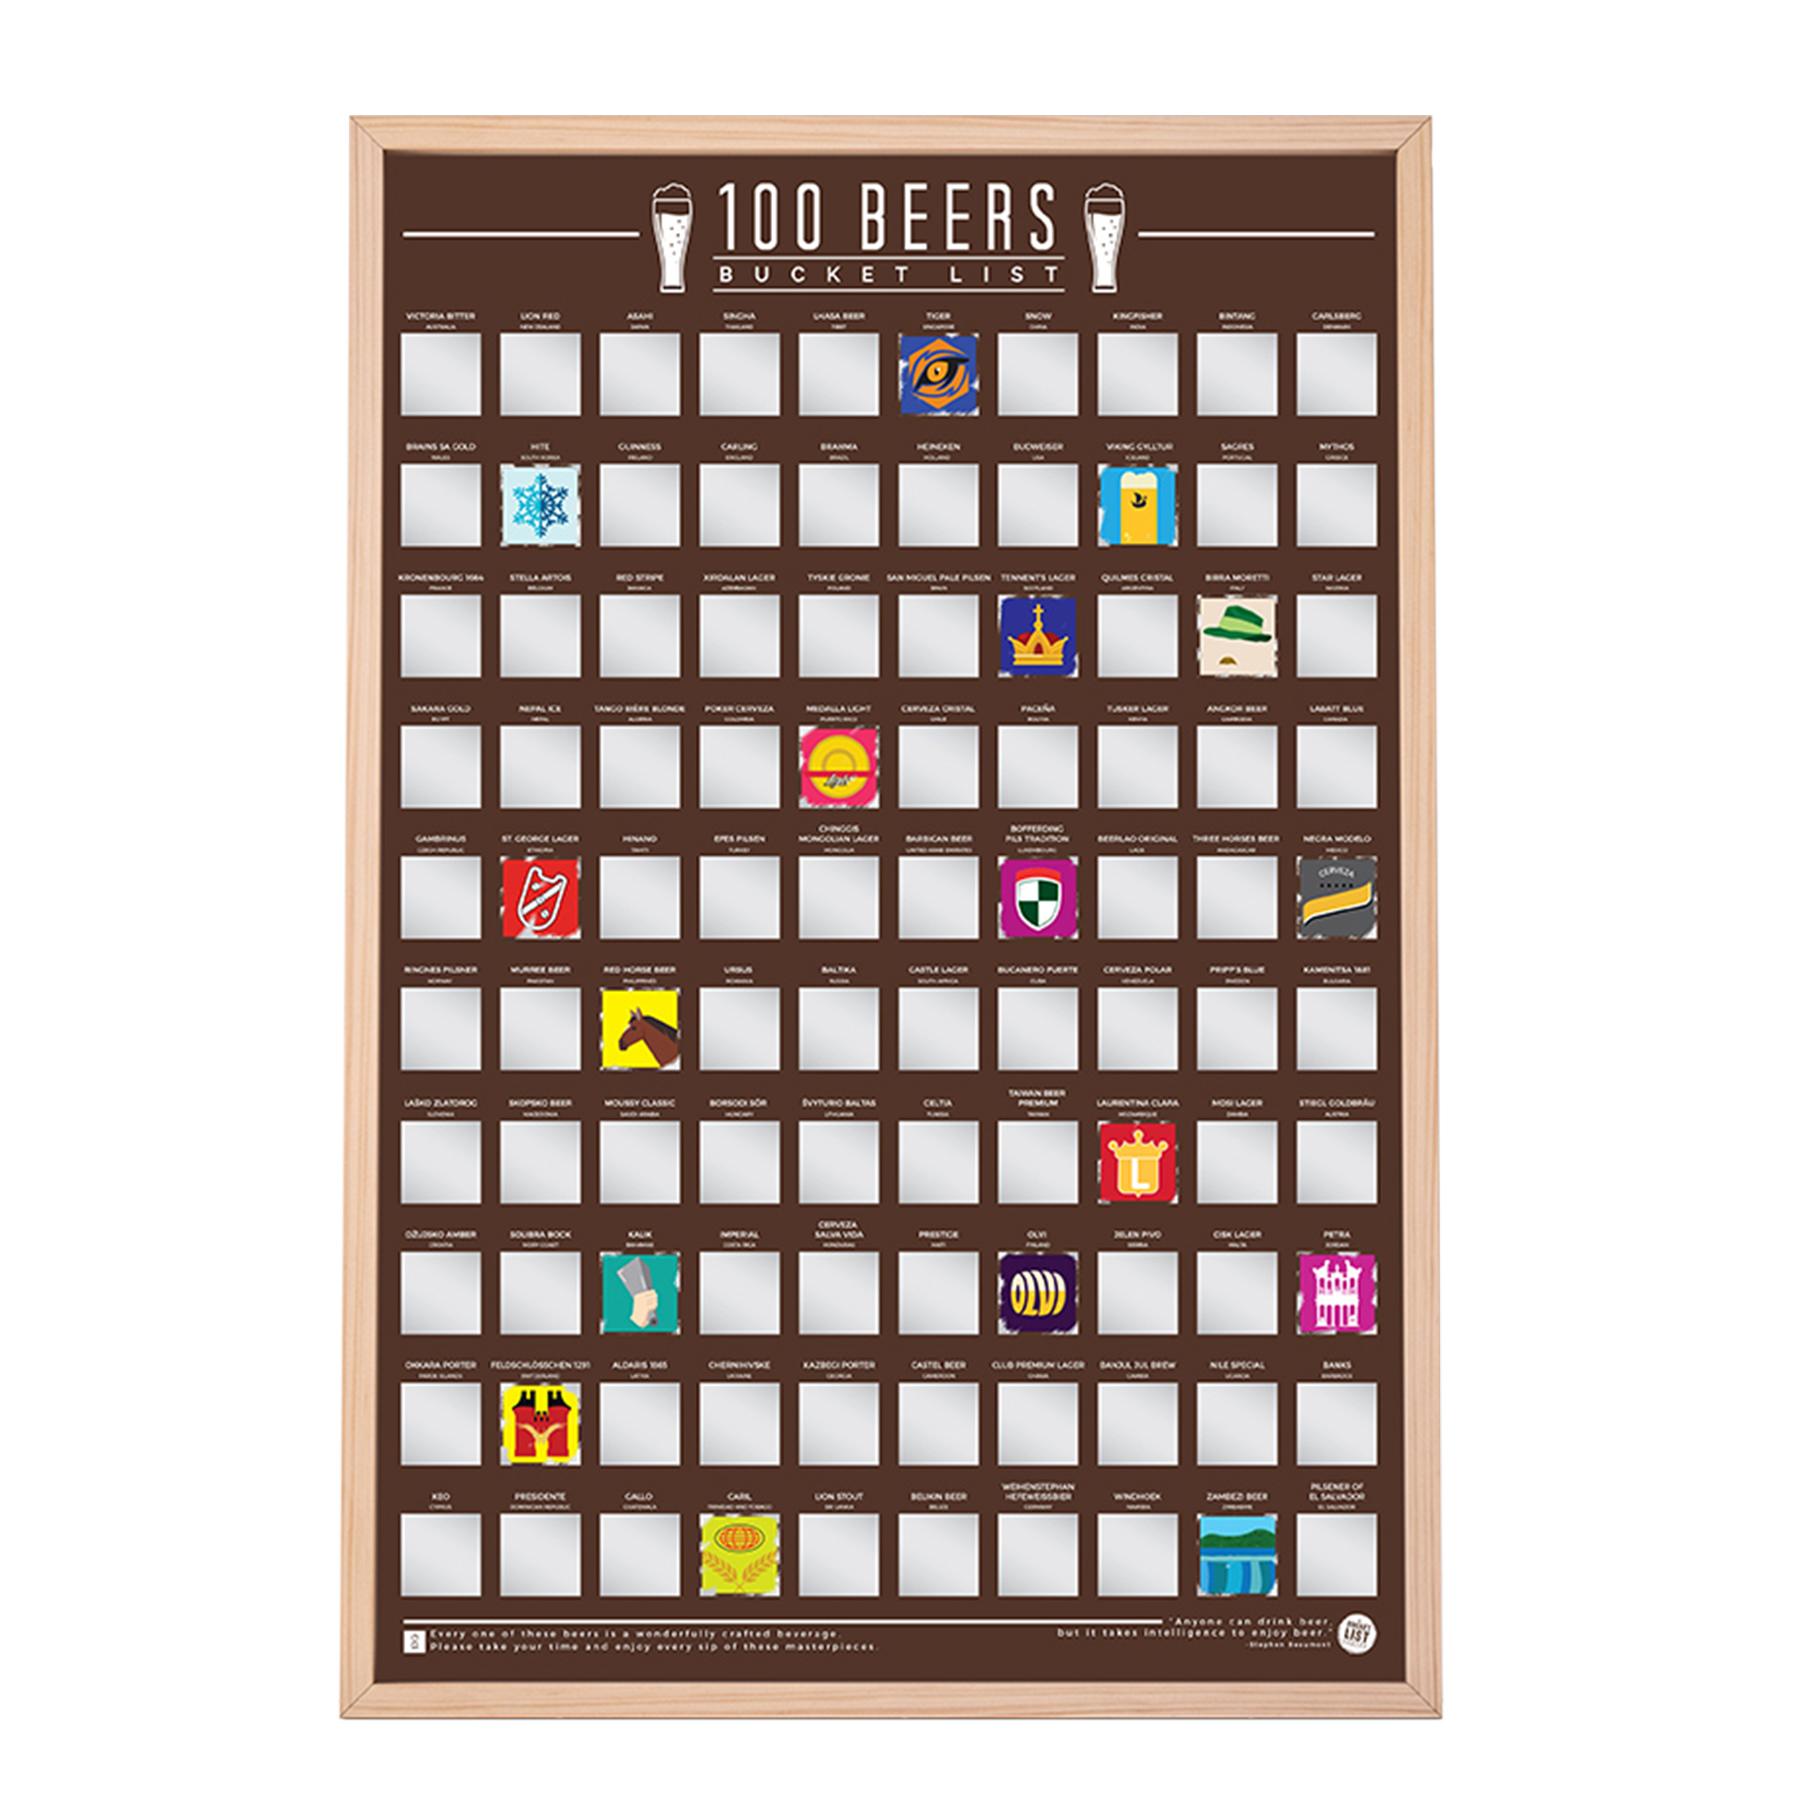 Rubbelkarte mit 100 internationalen Biersorten